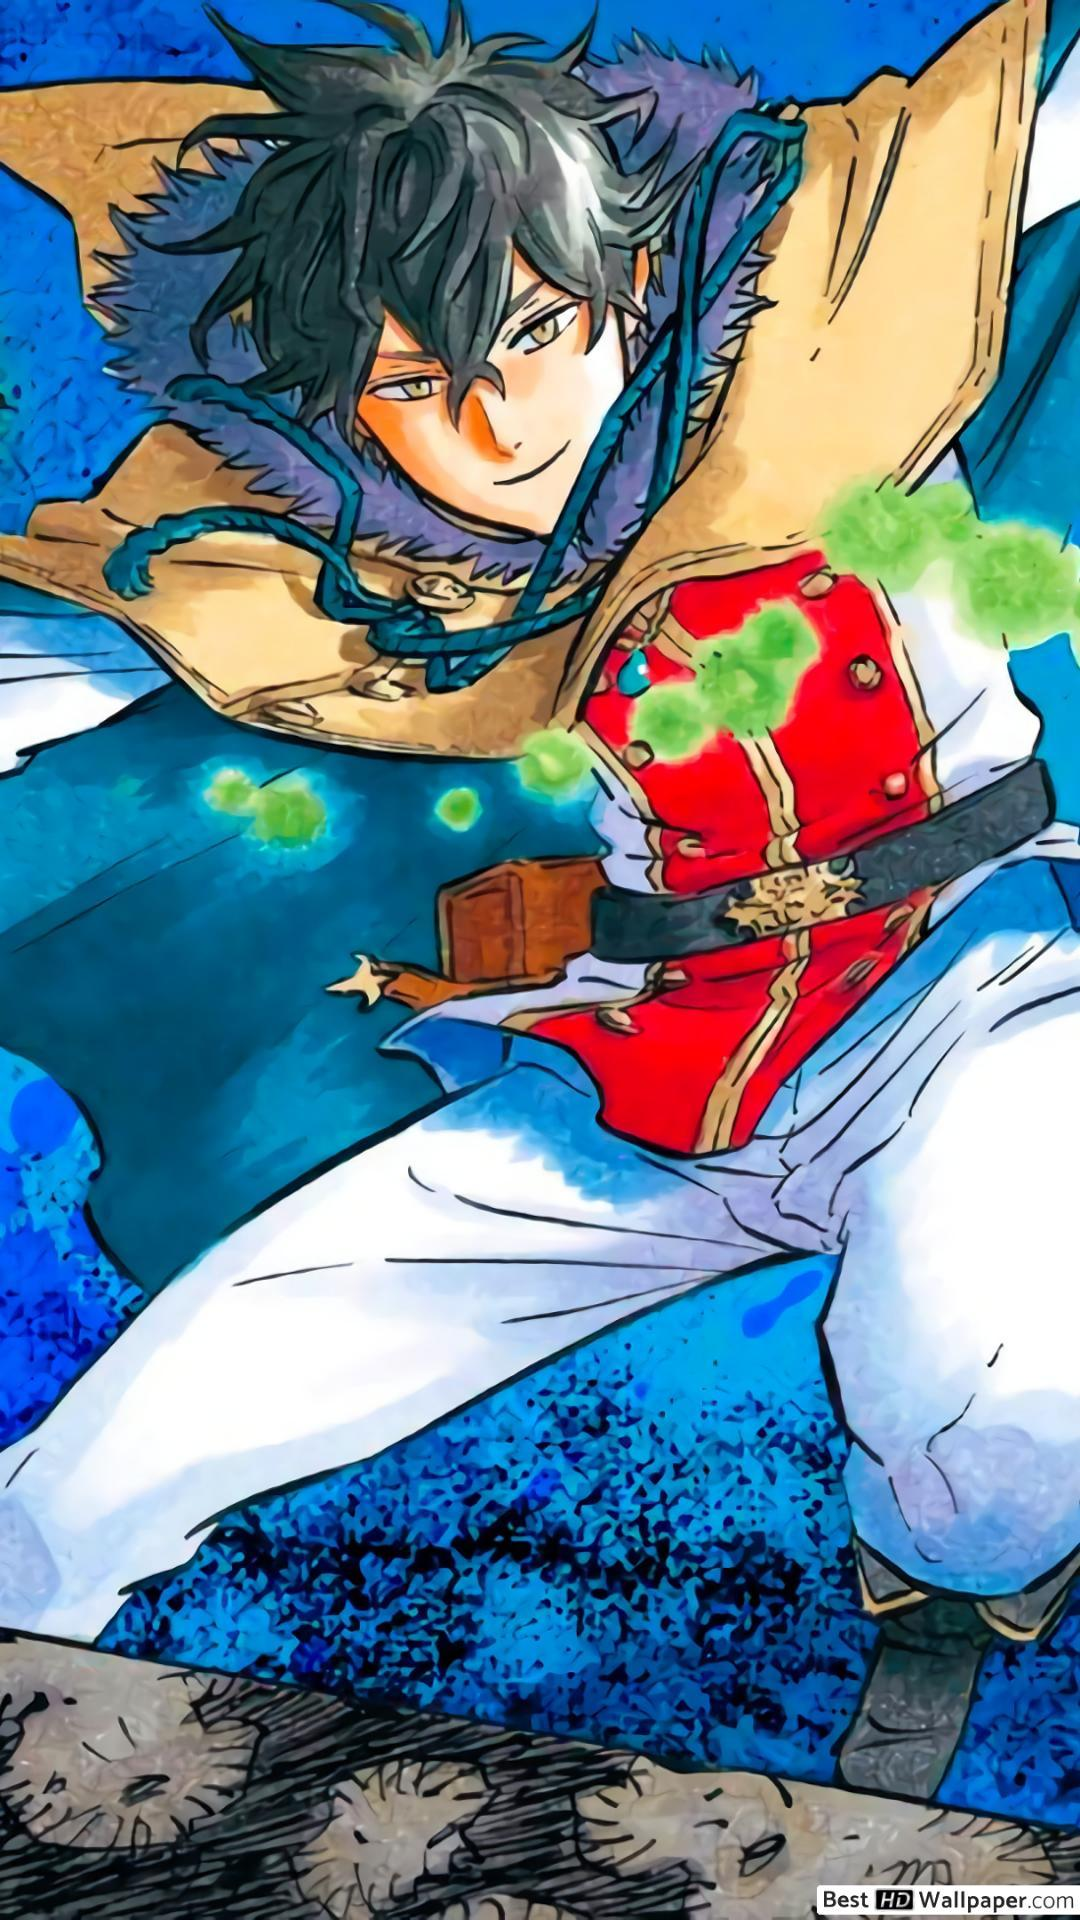 Yuno Black Clover Wallpaper Iphone Top Anime Wallpaper